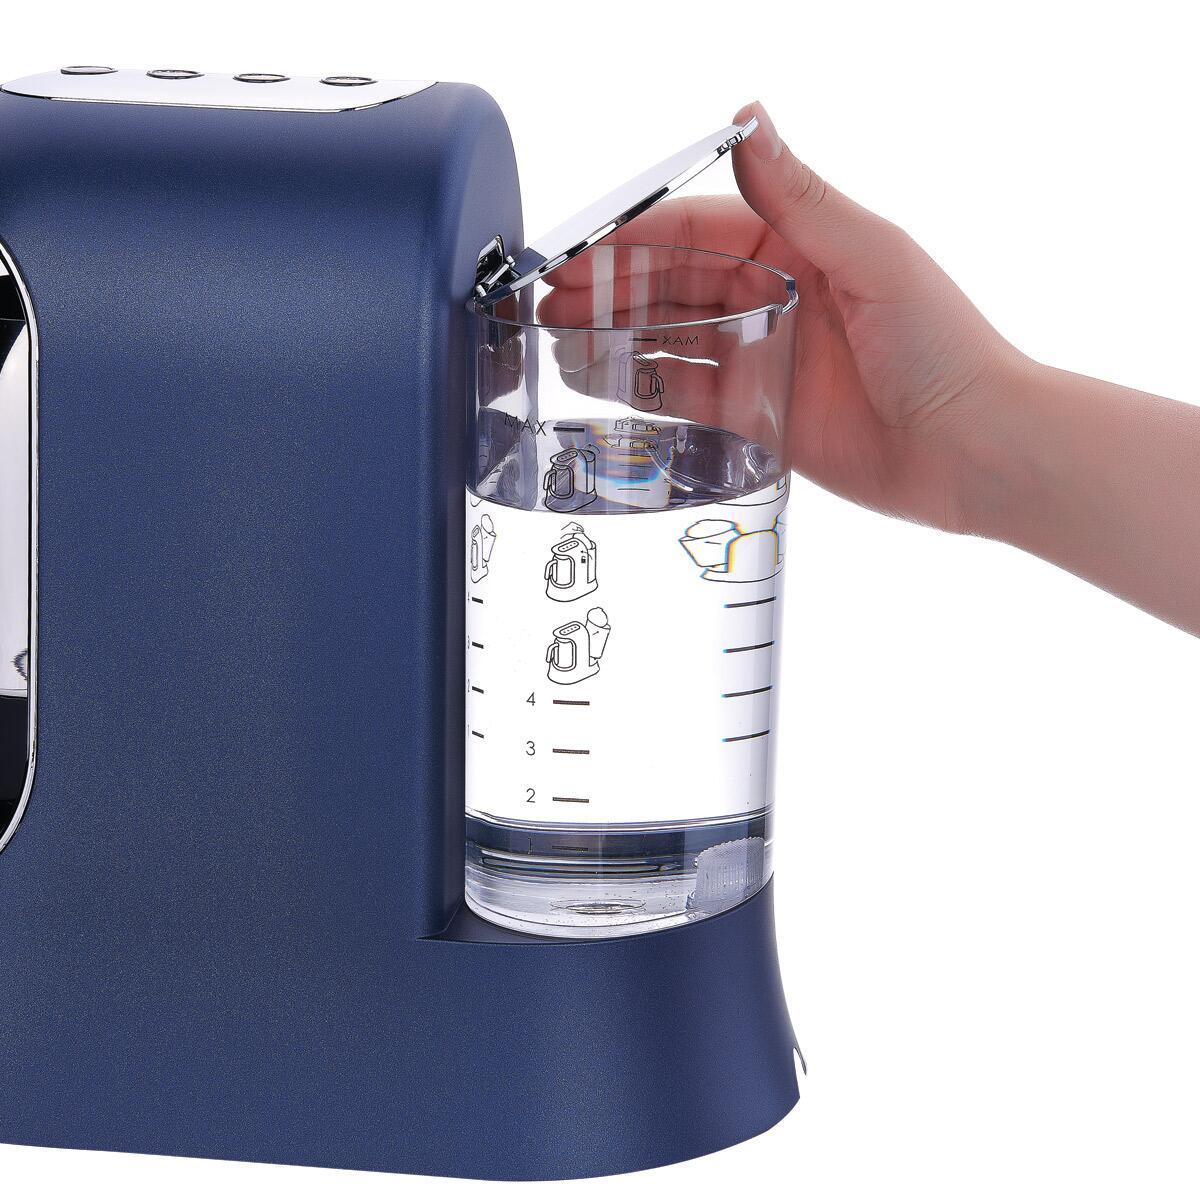 Korkmaz Kahvekolik Aqua Azura/Krom Otomatik Kahve Makinesi